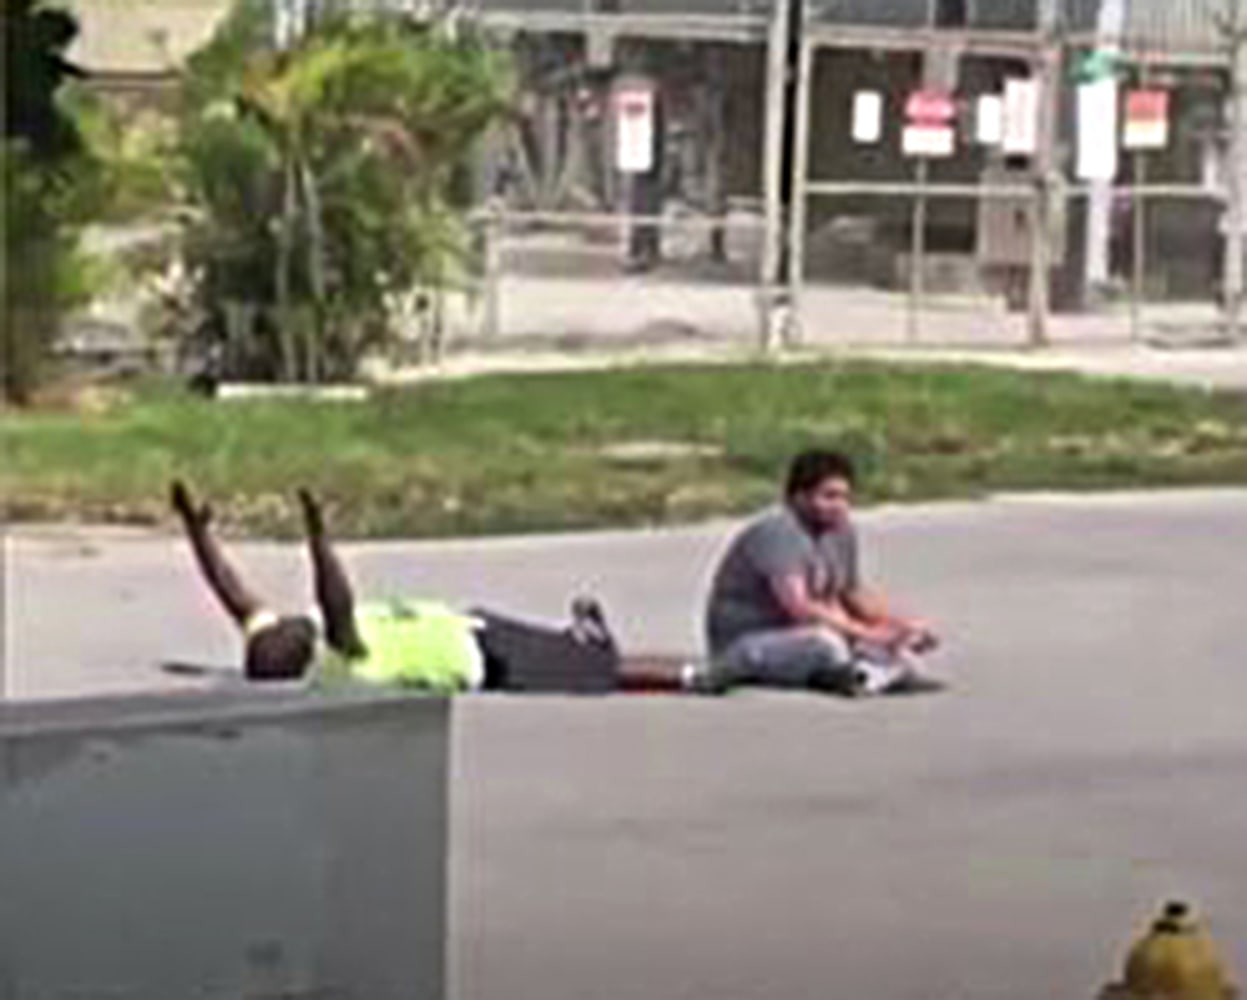 http://media4.s-nbcnews.com/j/newscms/2016_29/1632281/160721-miami-police-shooting-kinsey-mn-1725_c372dee1bfc4448095b2479160a934fa.nbcnews-ux-2880-1000.jpg